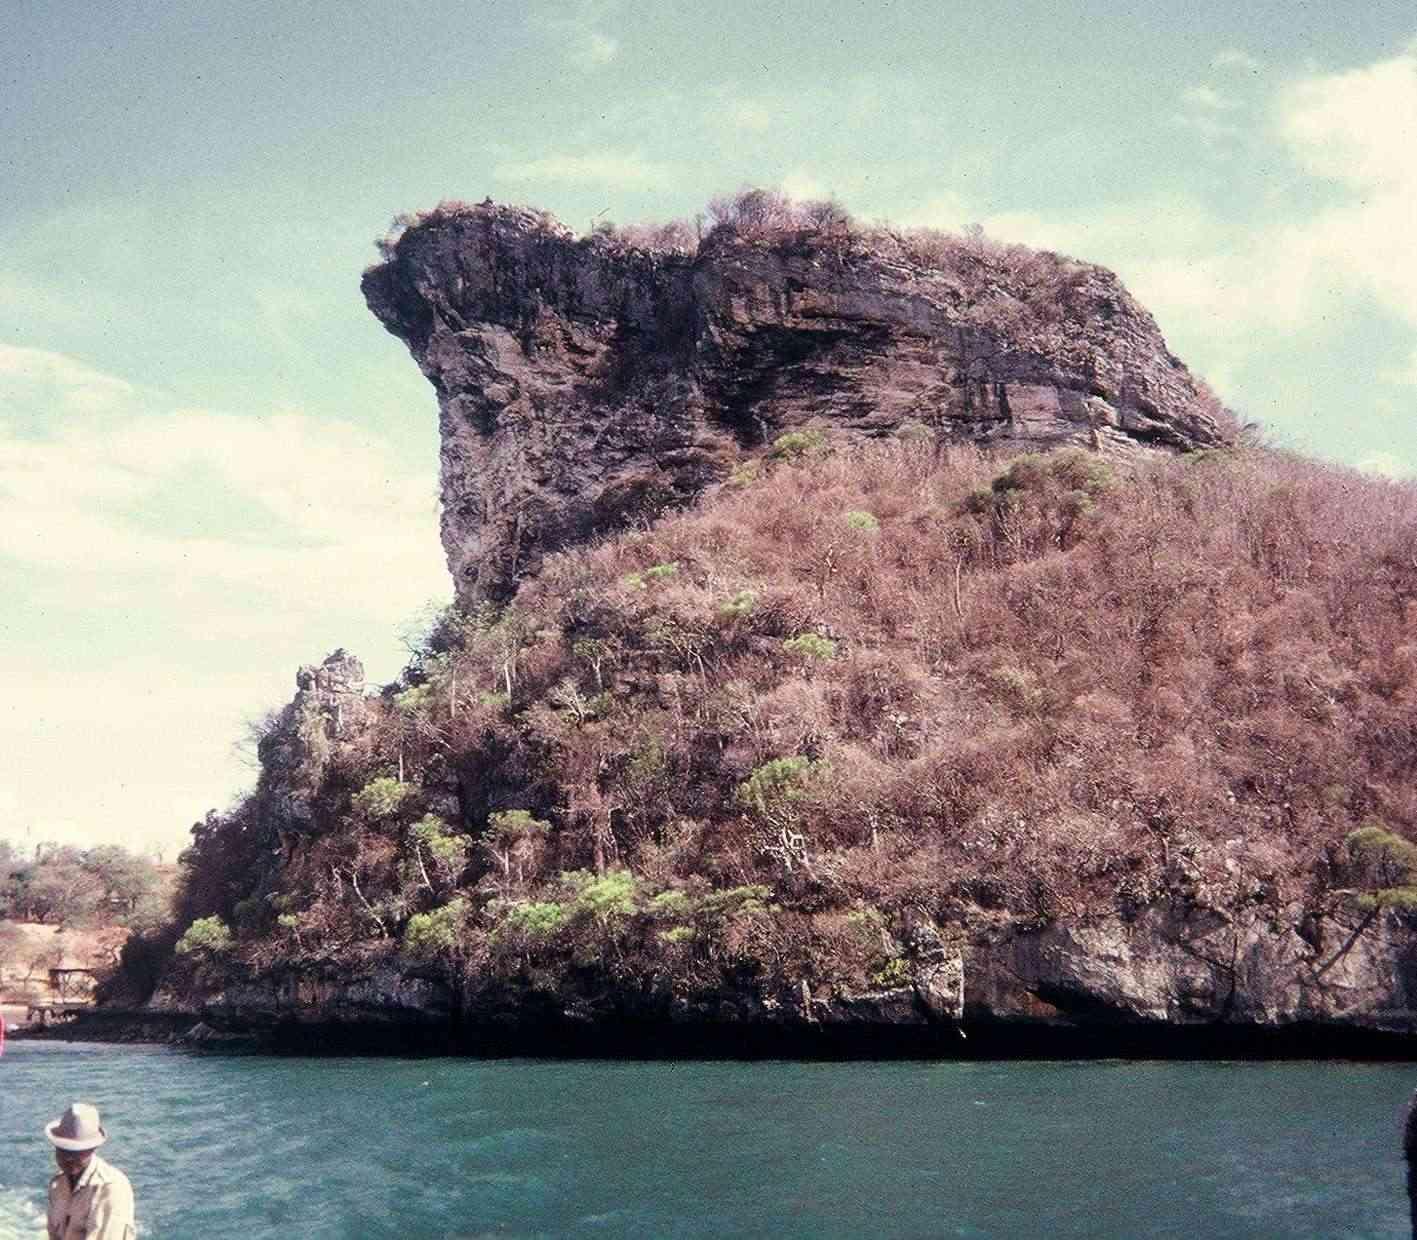 [Divers campagne Madagascar] CAP DIEGO AU CID 1972 - Page 3 Cd1_pa23